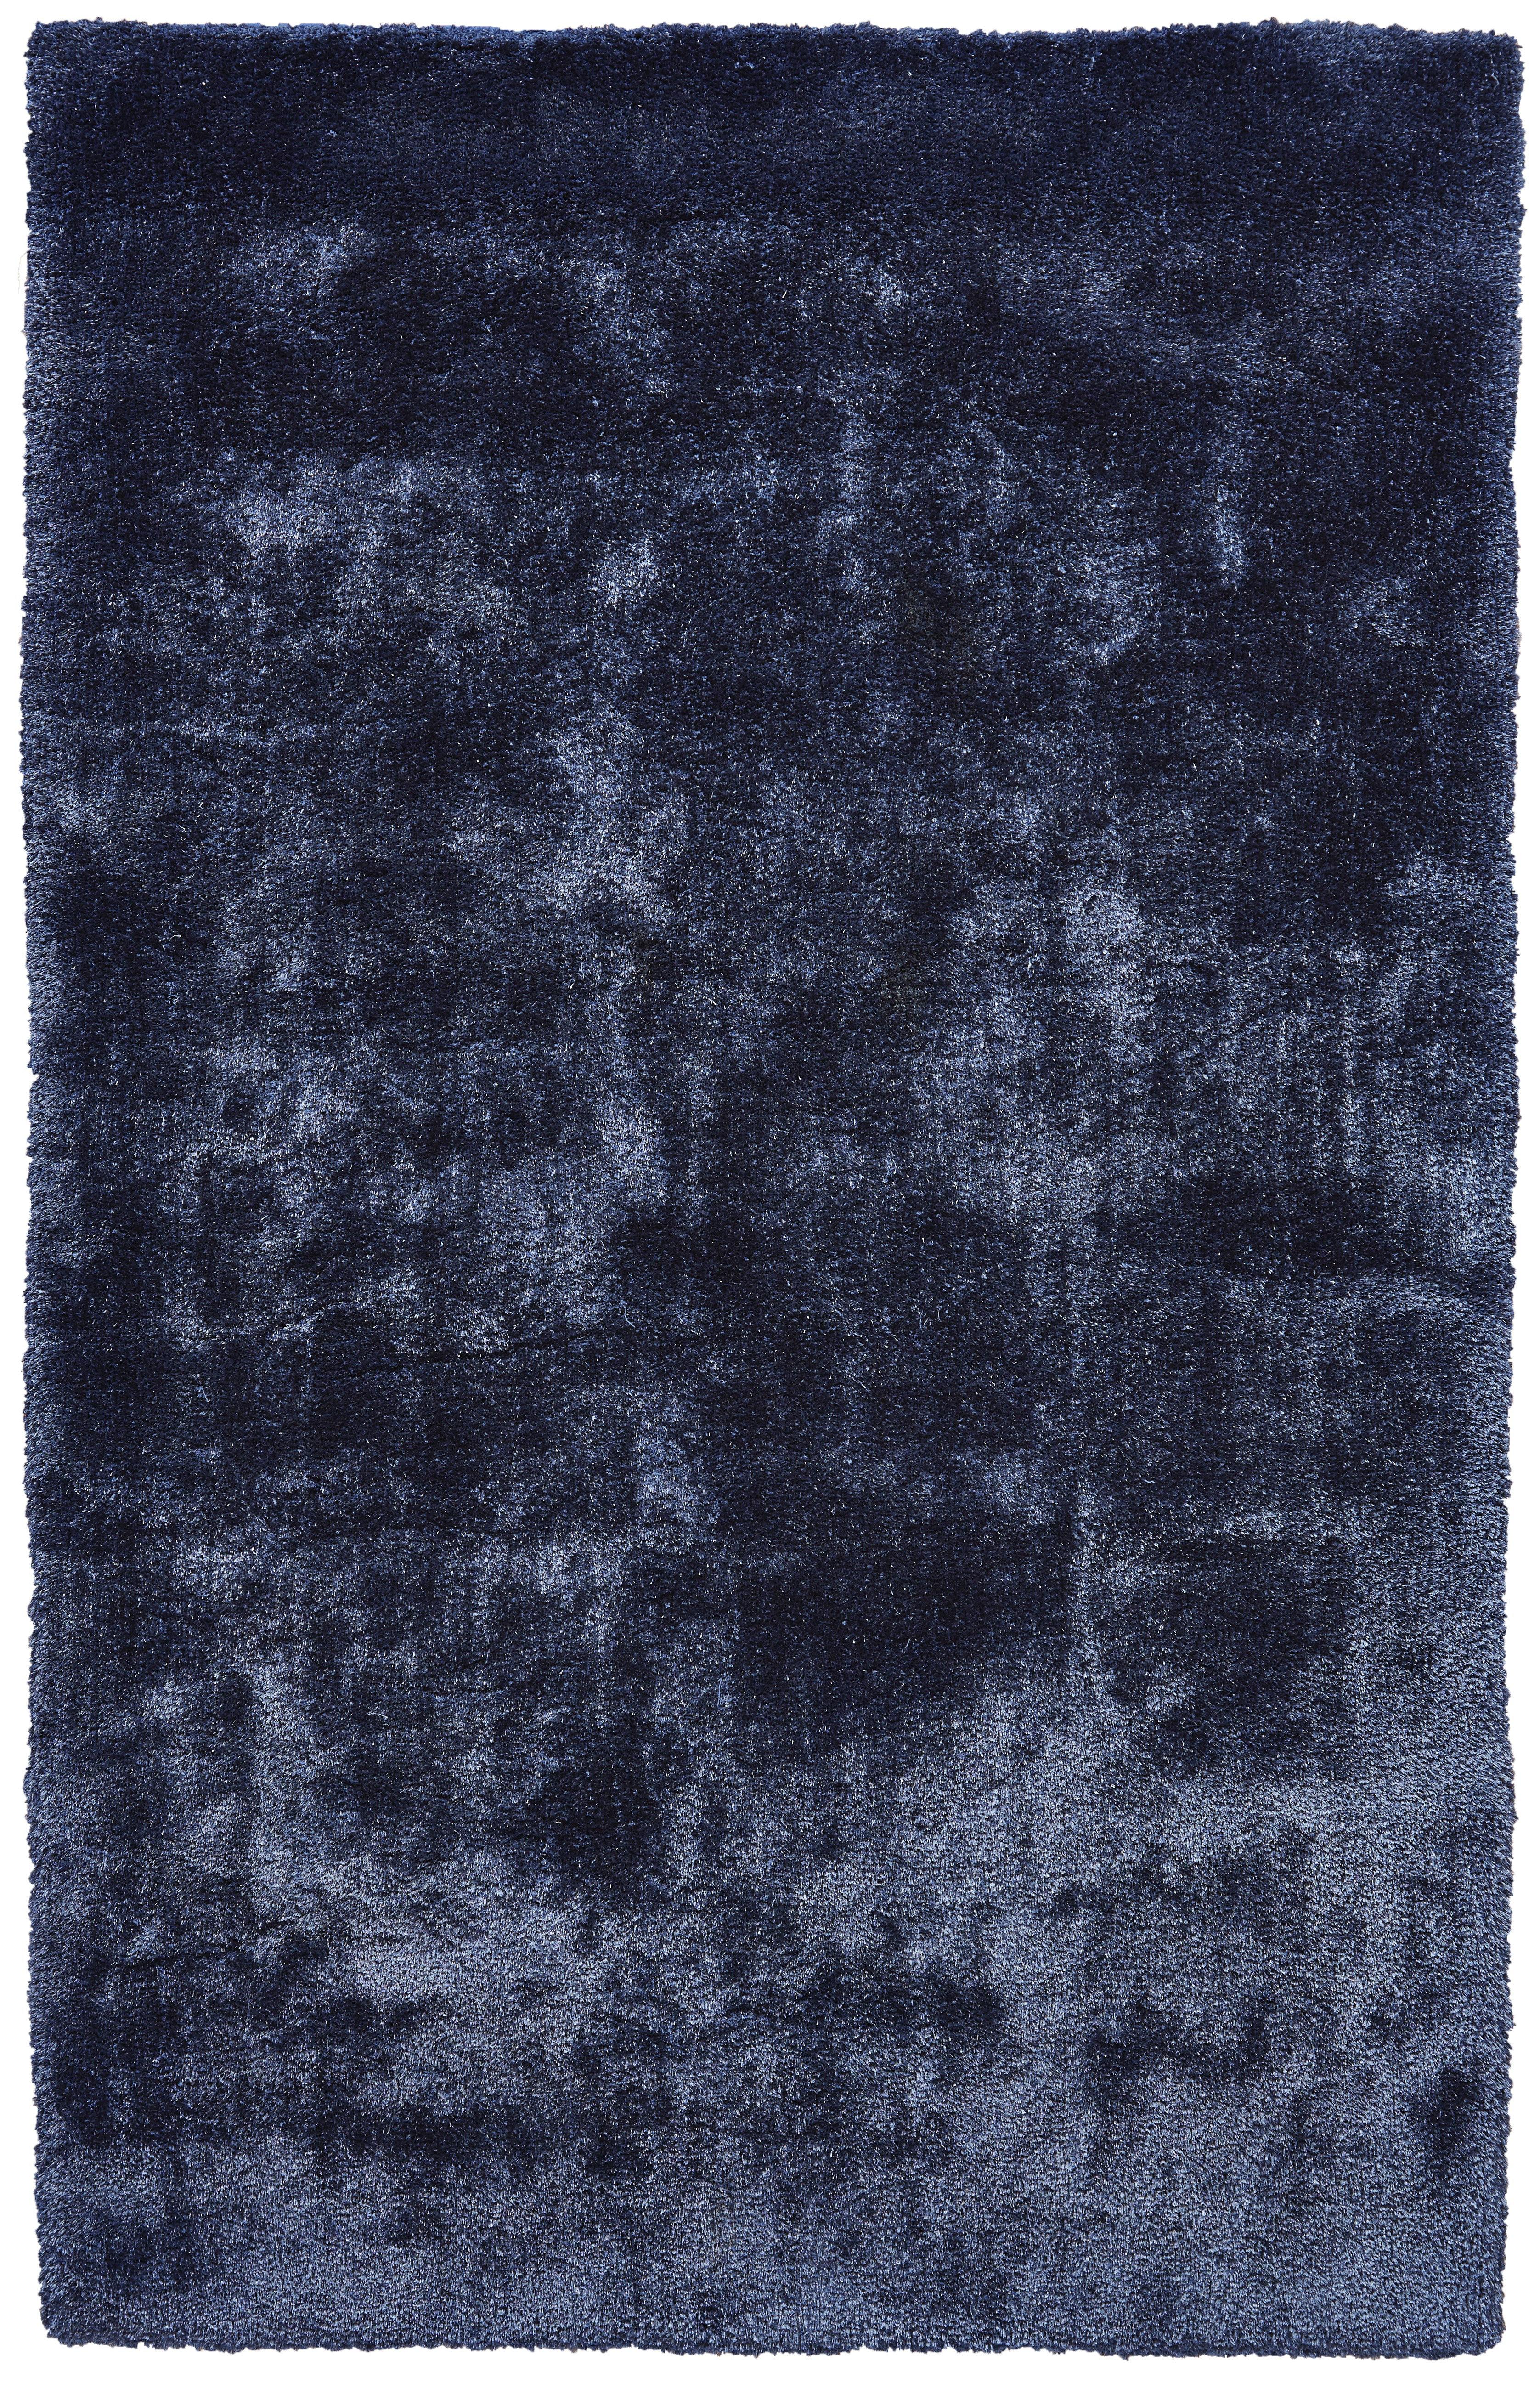 Ebern Designs Millie Hand Tufted Dark Blue Area Rug Reviews Wayfair